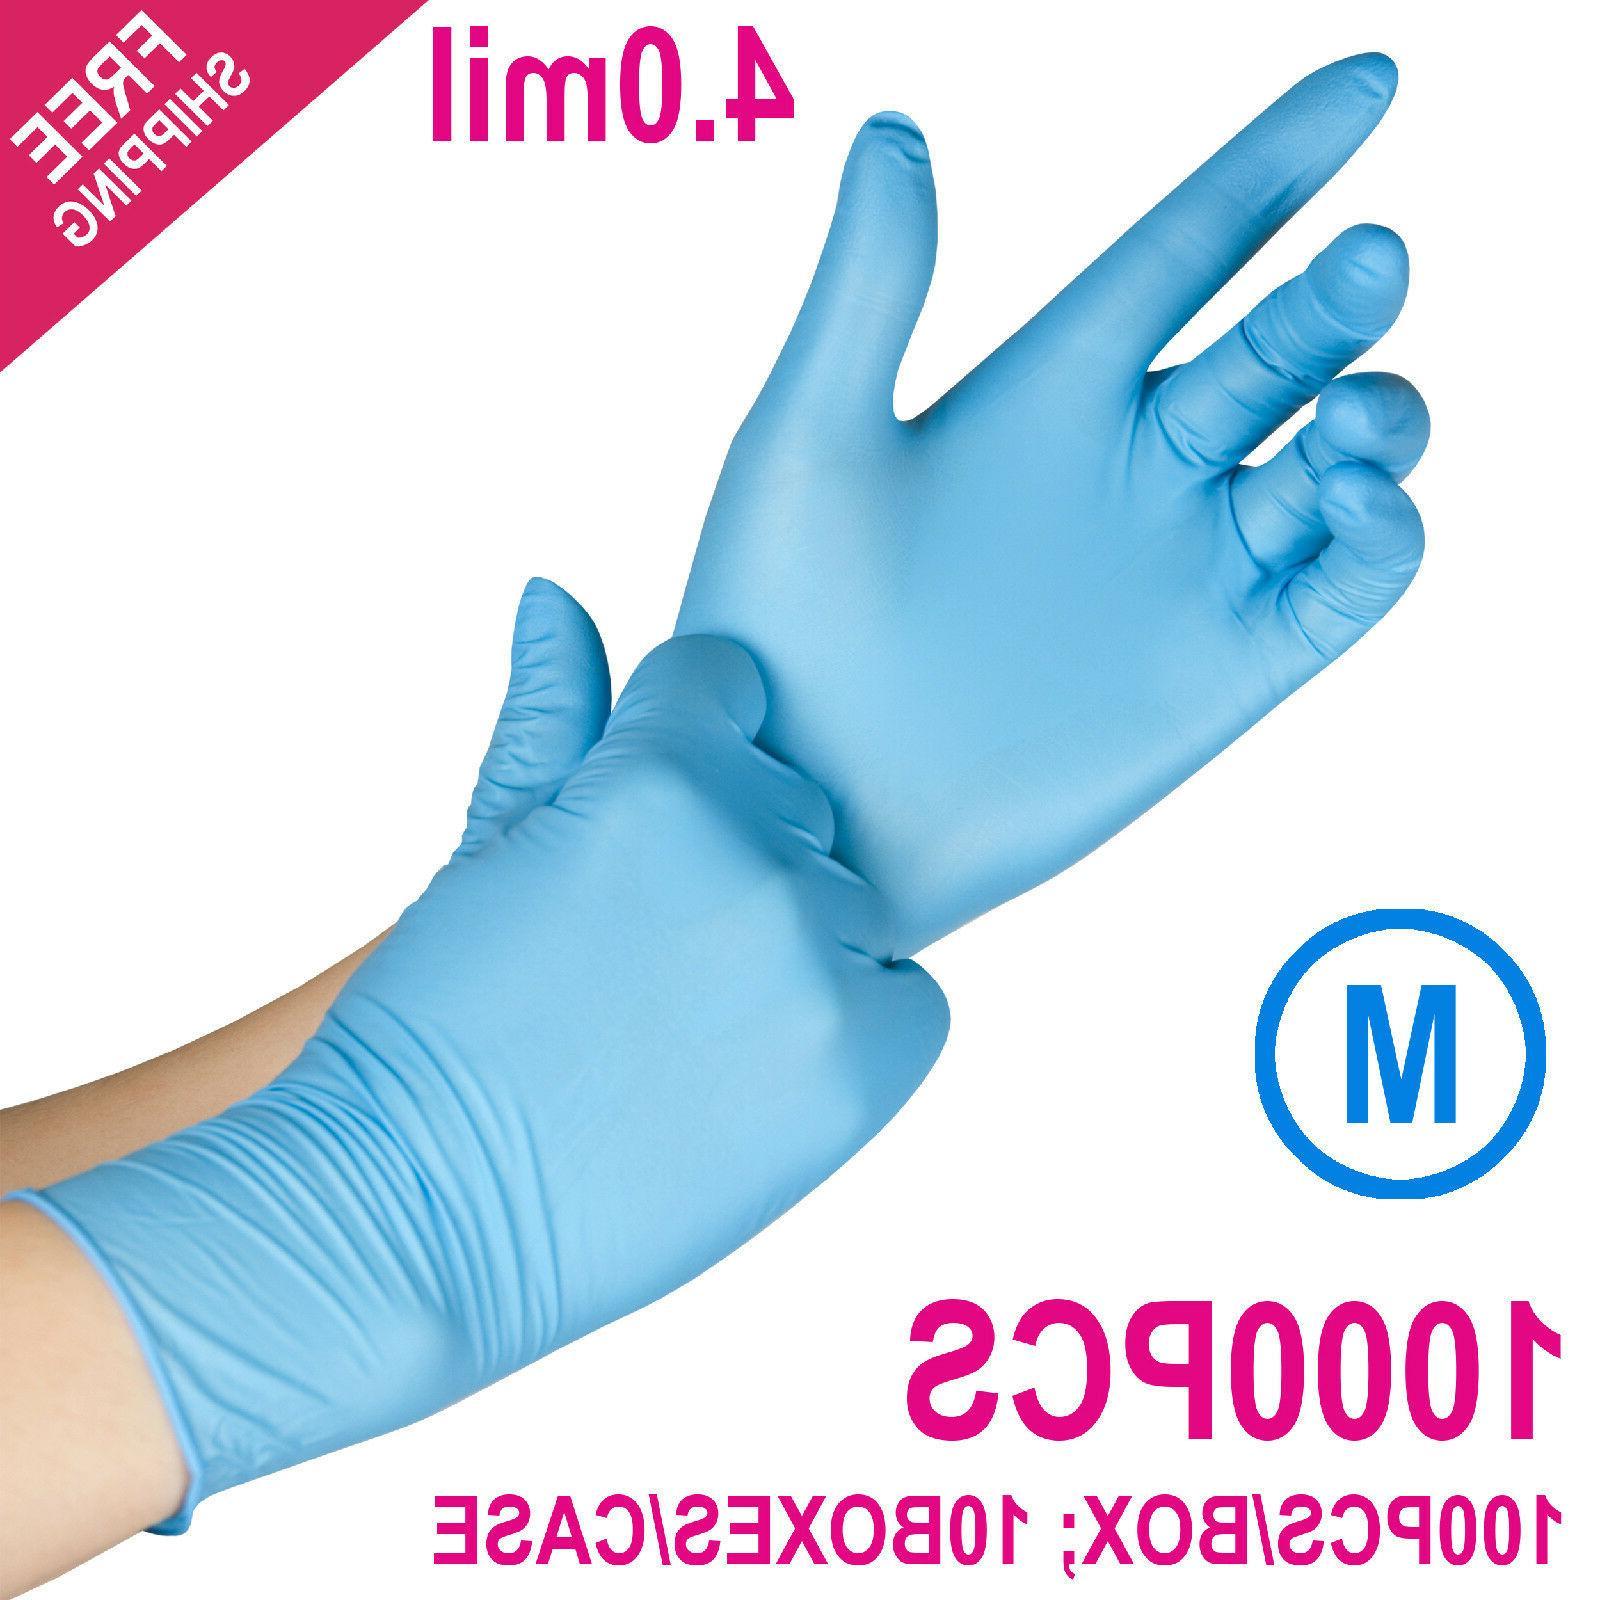 1000/Case Disposable Powder-Free Nitrile Medical Exam  Glove